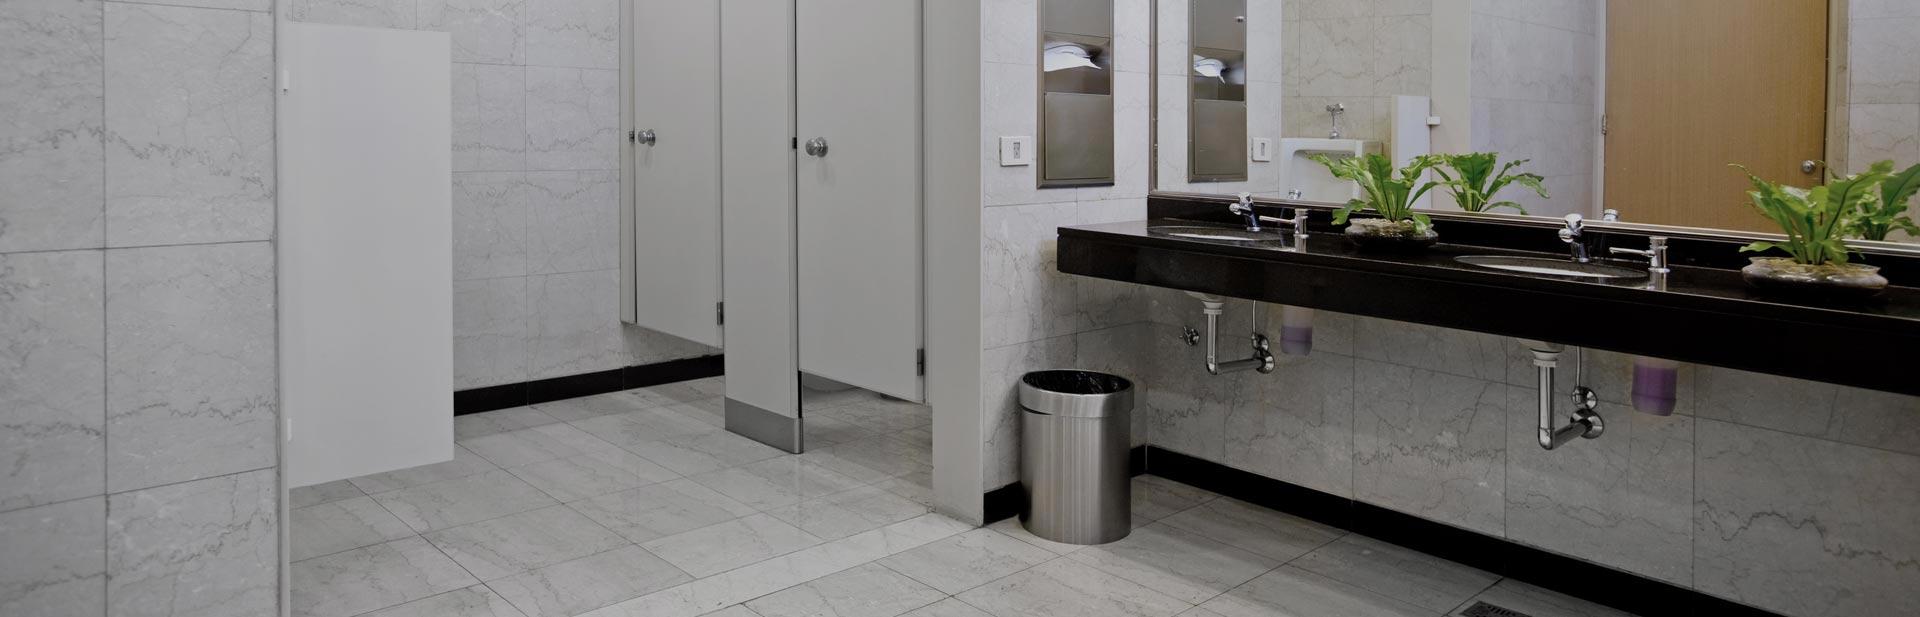 Marble terrazzo concrete floor polishing services houston tx natural stone tile and terrazzo dailygadgetfo Images